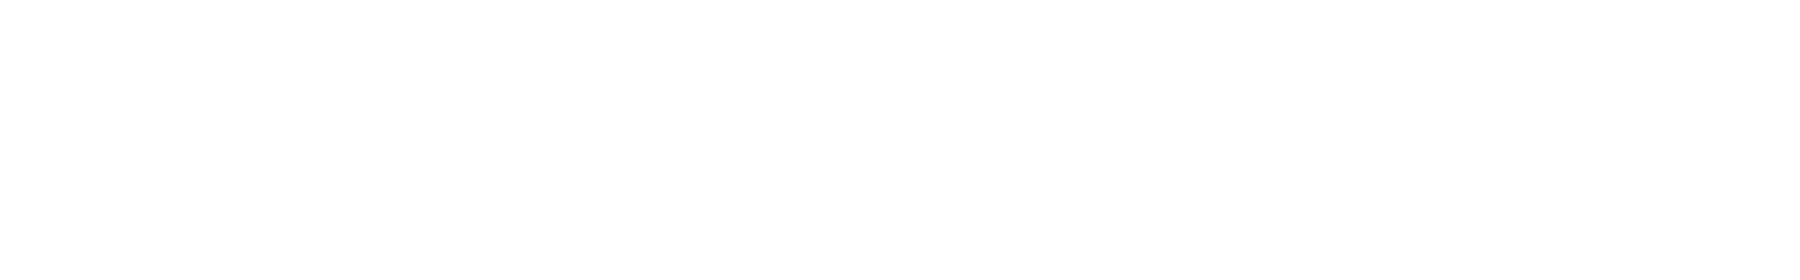 vedh melodyloop 050 am 7 9 120bpm